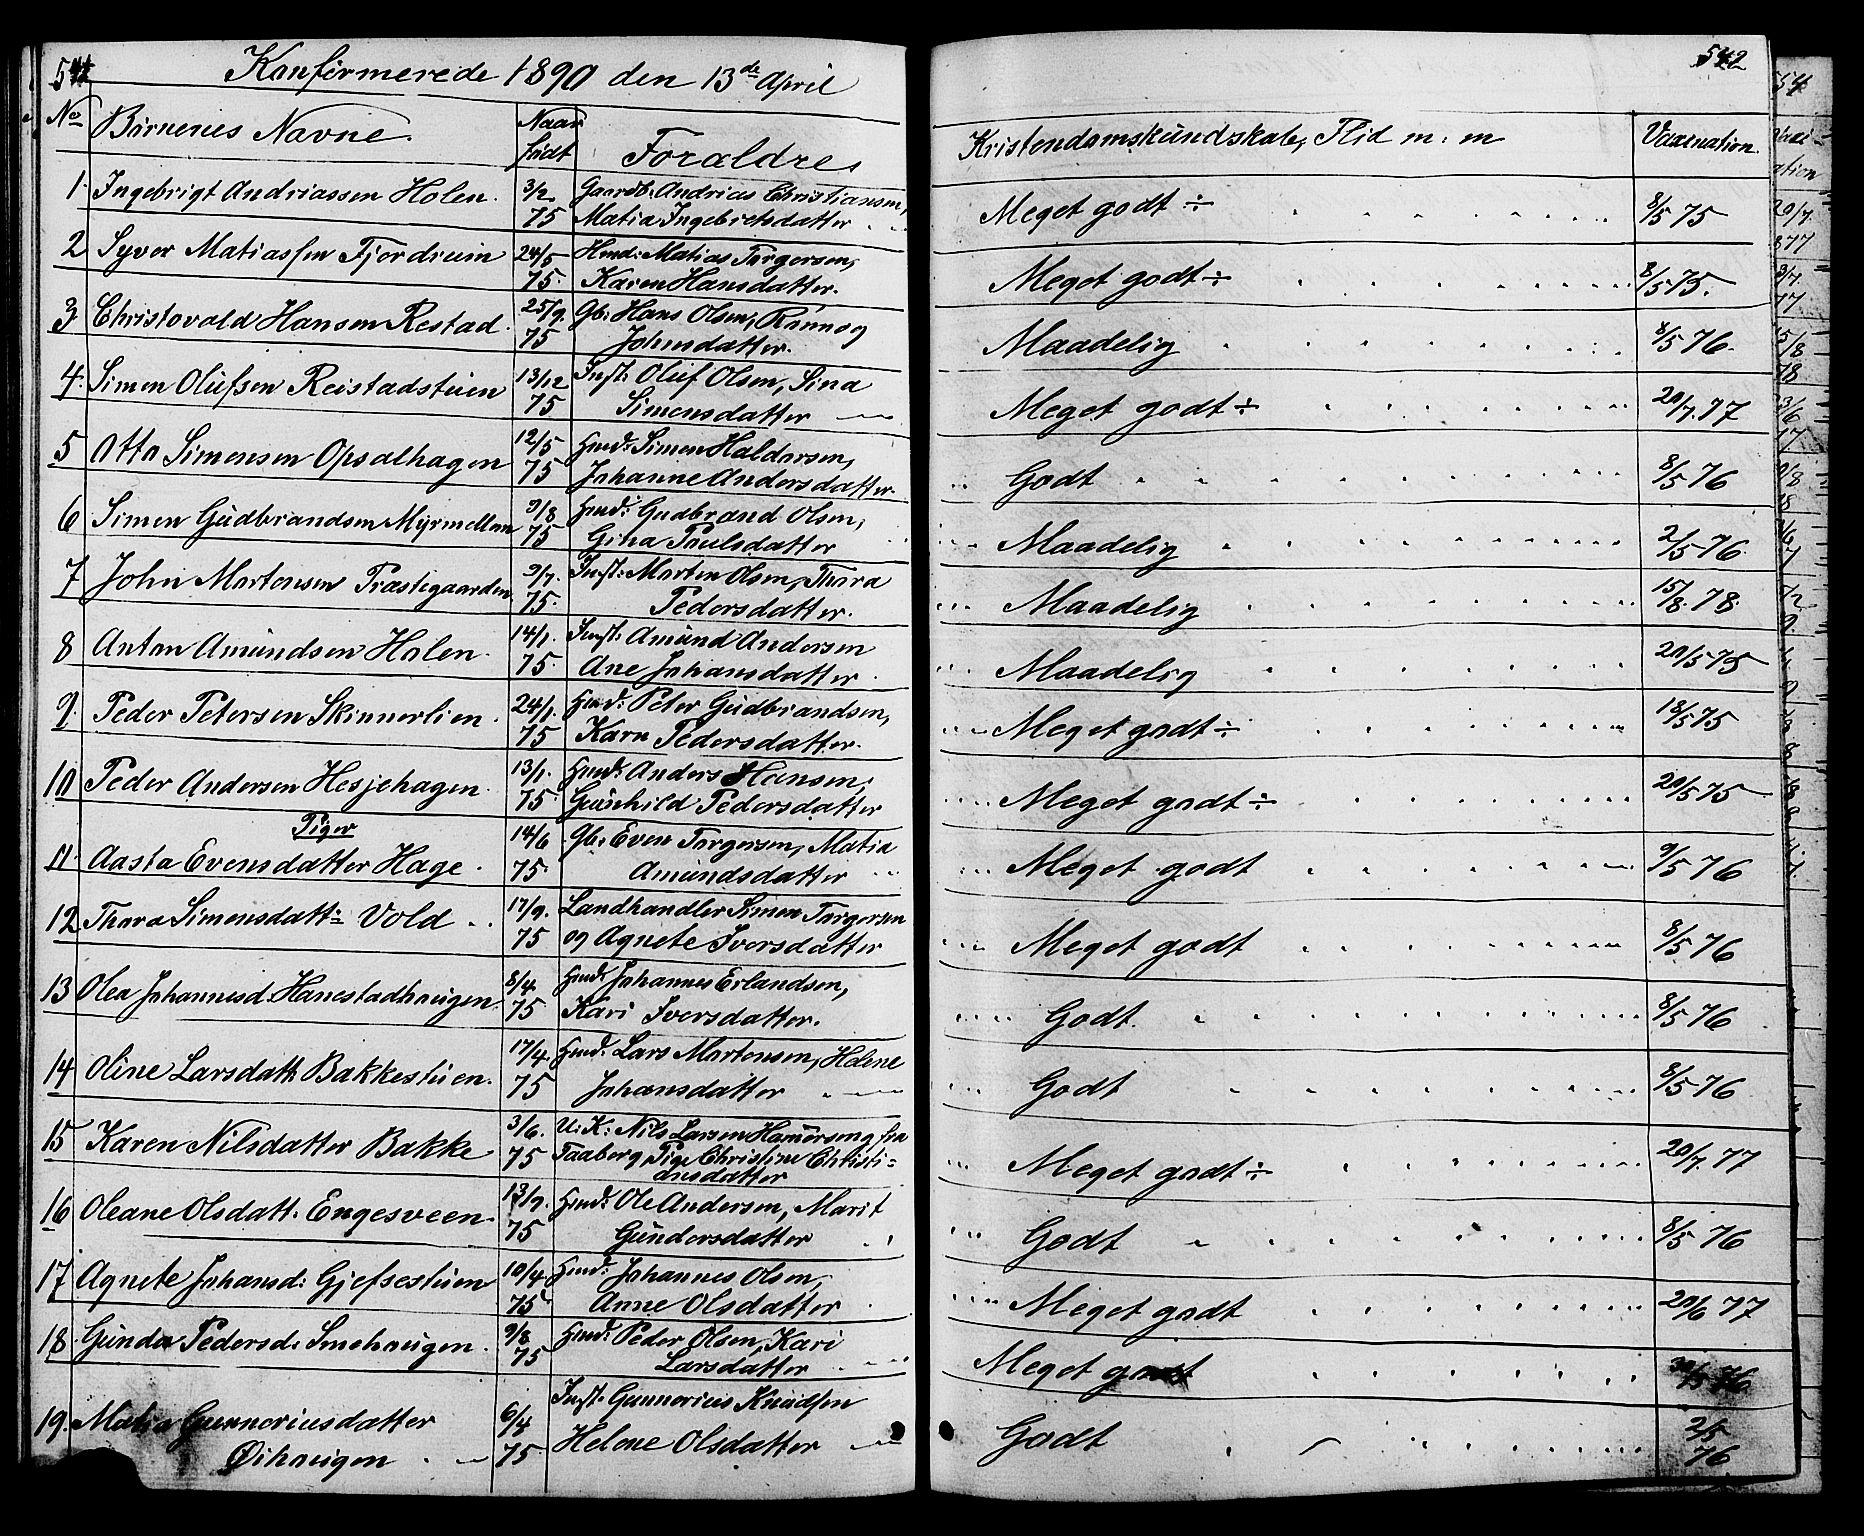 SAH, Østre Gausdal prestekontor, Klokkerbok nr. 1, 1863-1893, s. 541-542